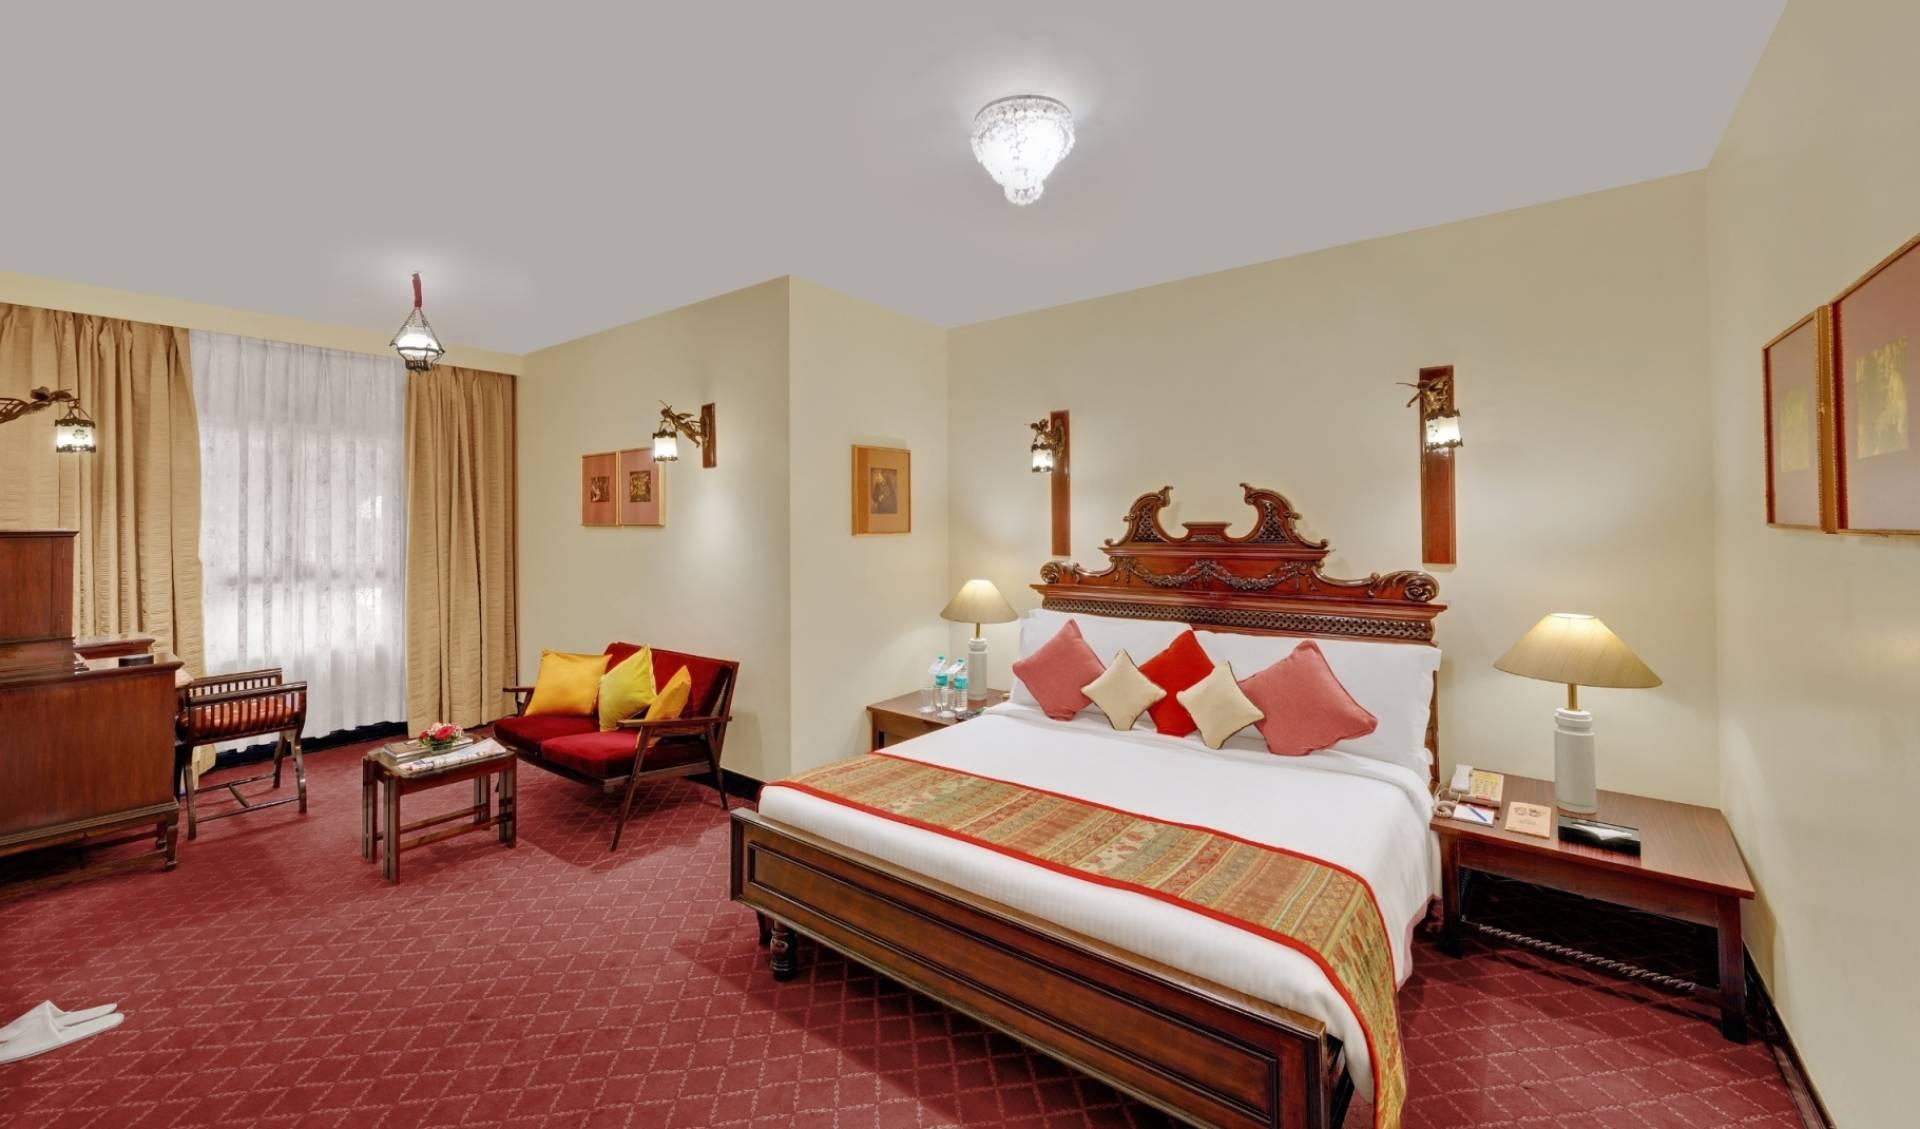 chennai pallava suite ambassador pallava bed - The Ambassador | Heritage Hotels in Mumbai, Aurangabad, Chennai - Ambassador Pallava Chennai